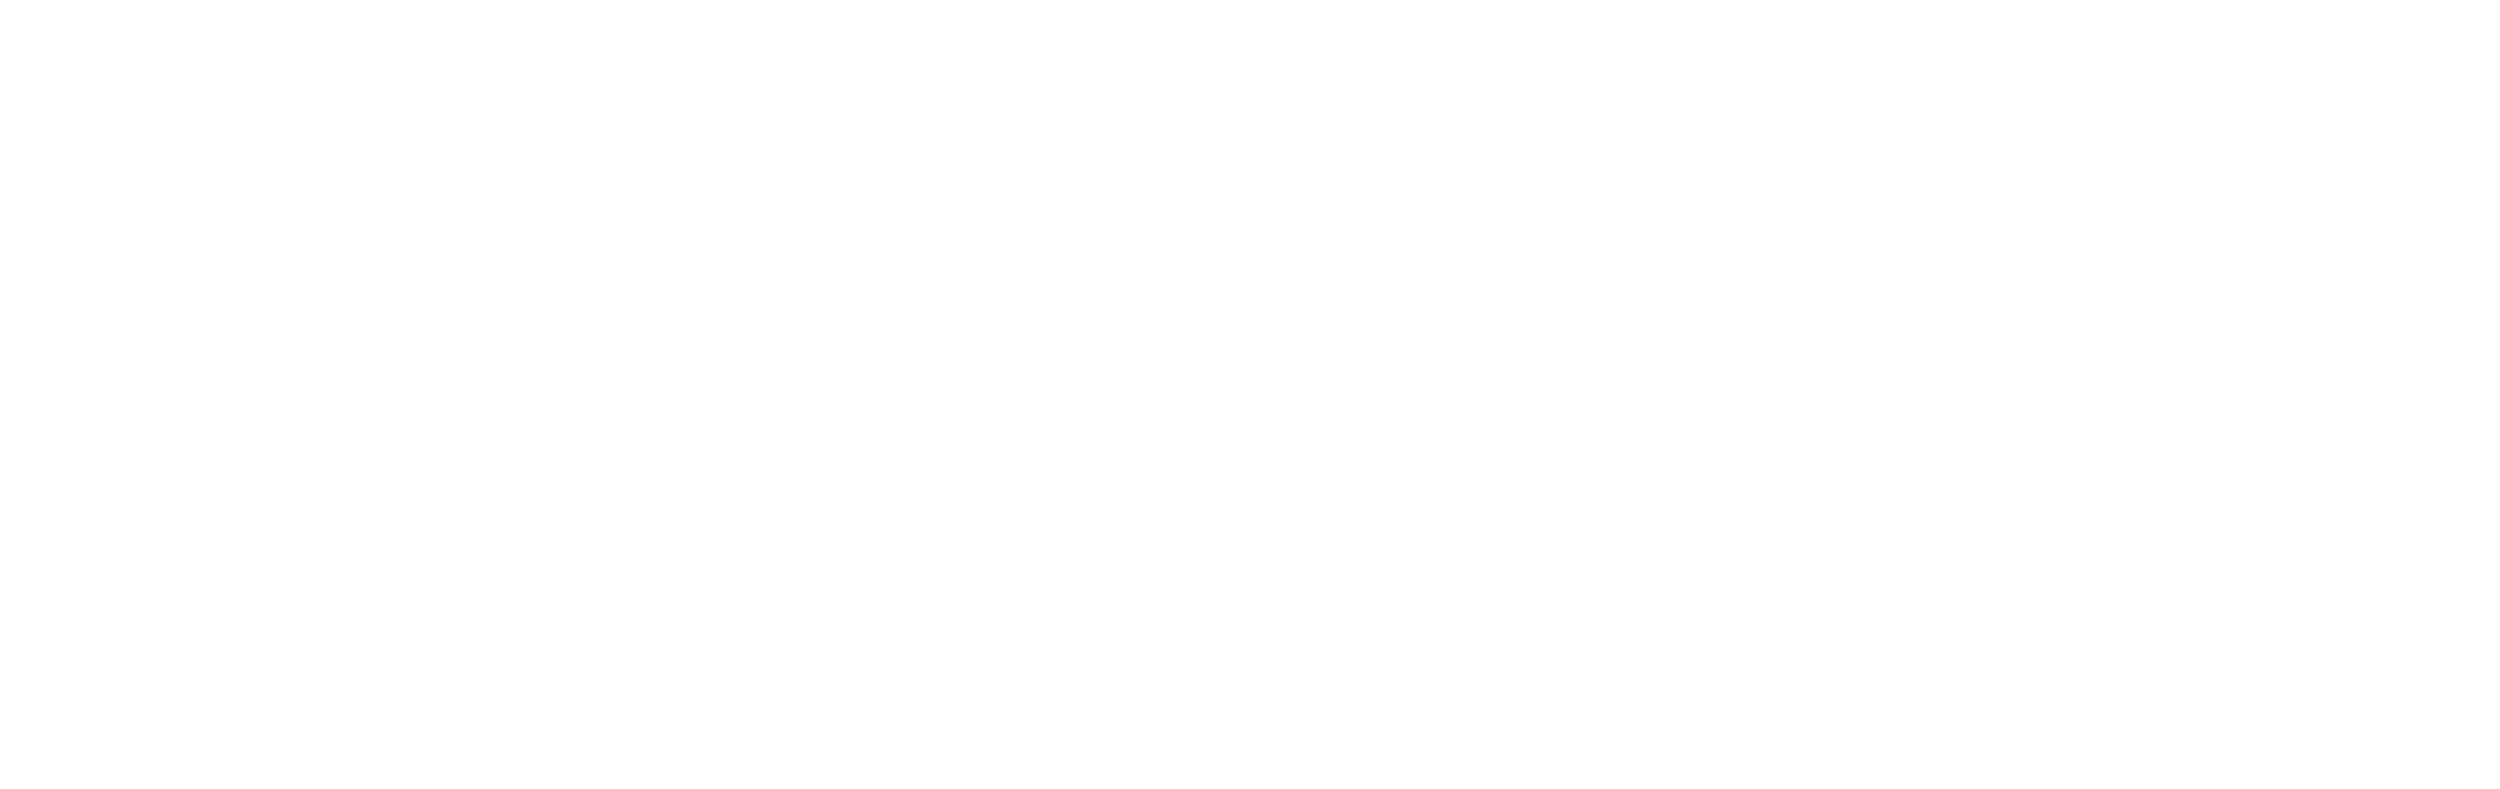 Vice_Logo1.png